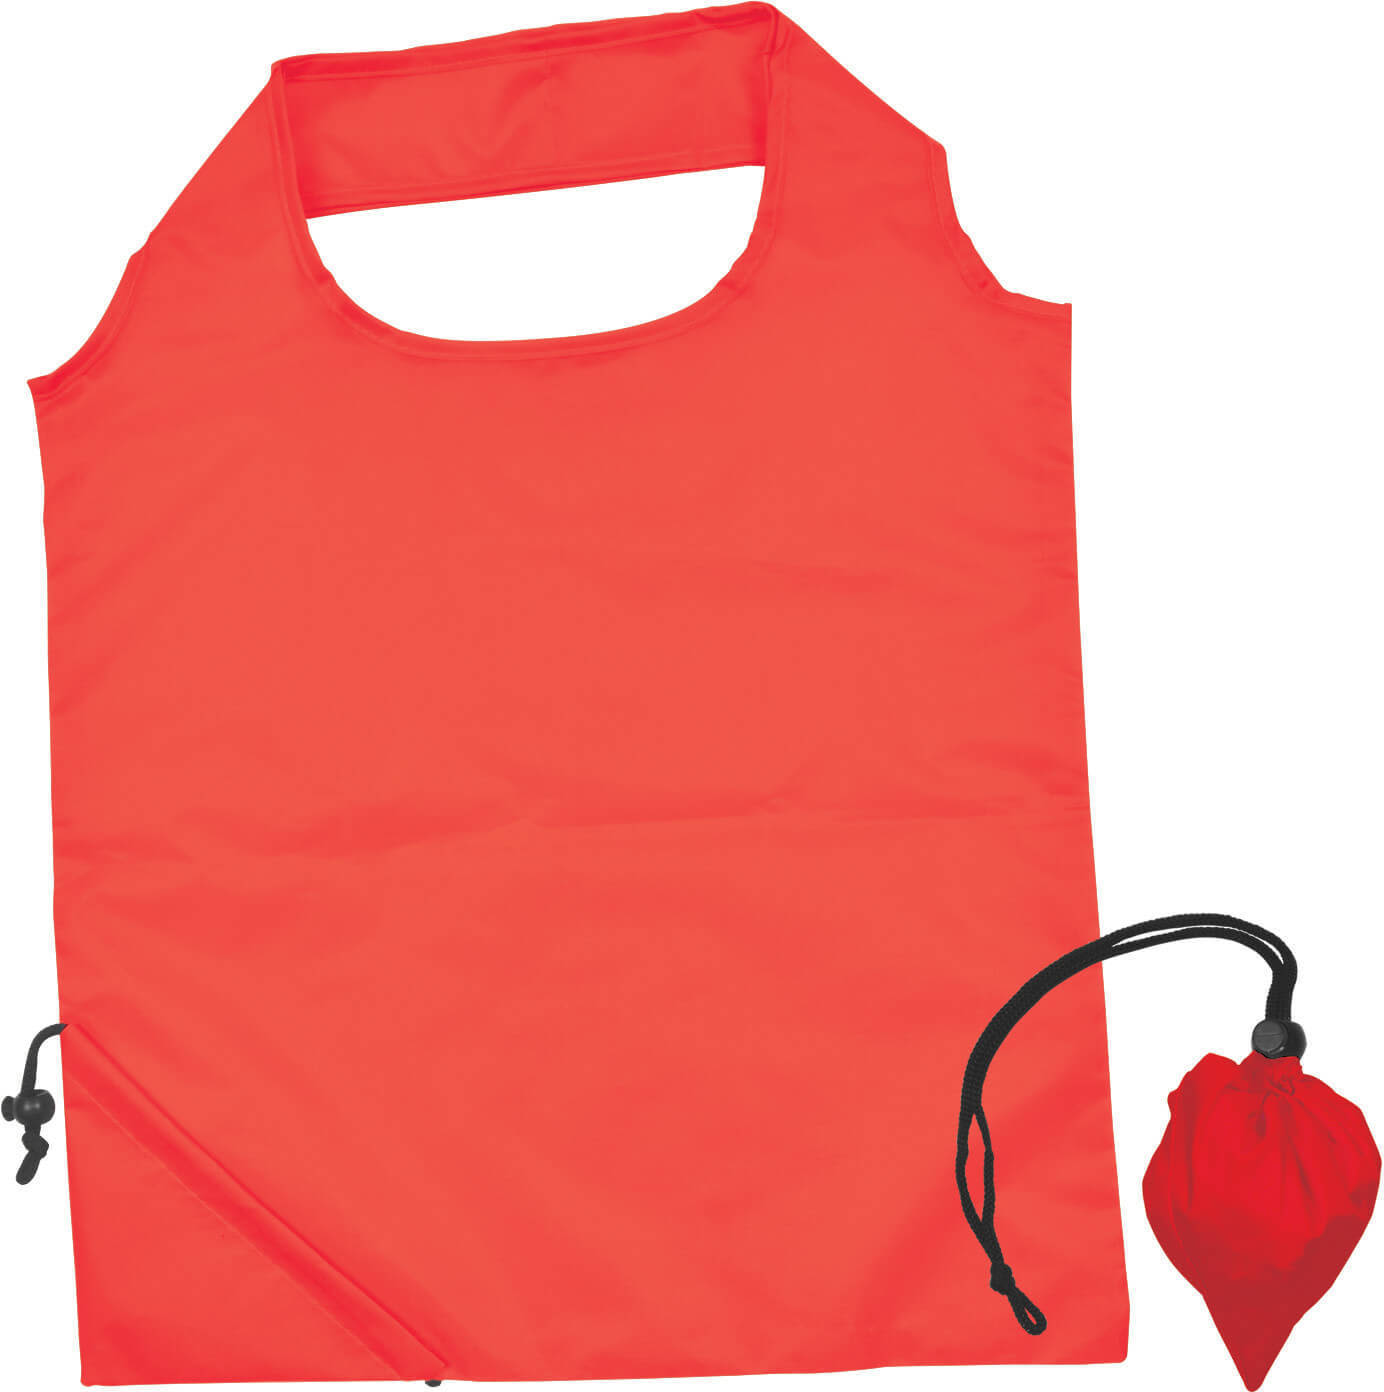 Red Folding Polyester Shopping Bag